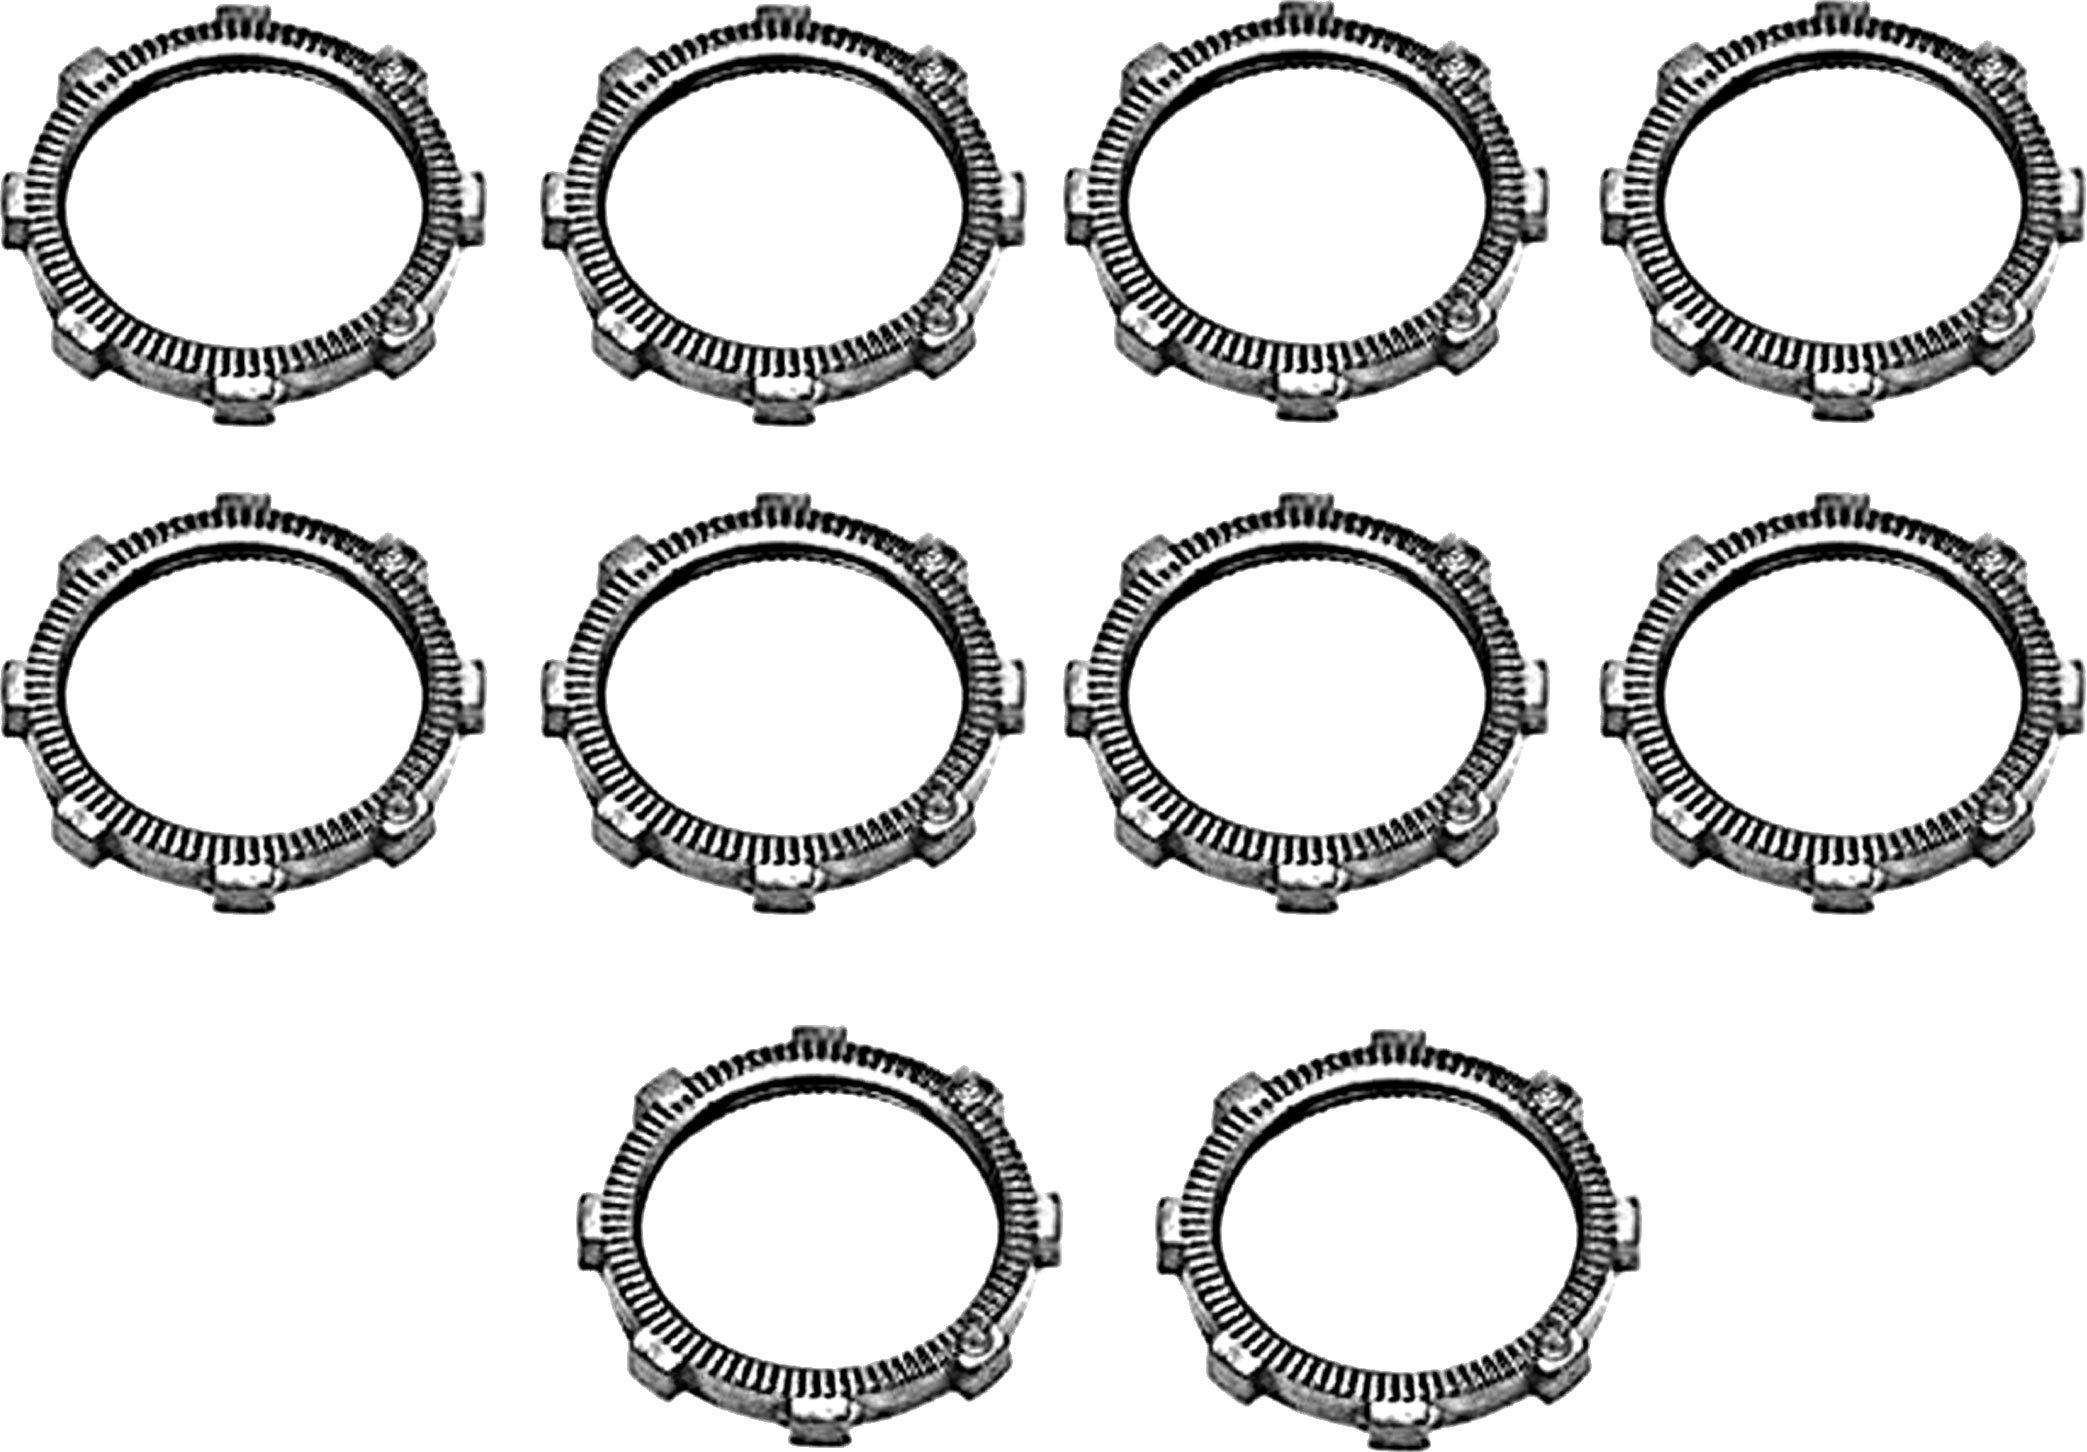 Bridgeport 100 3/8-Inch Zinc Die Cast Conduit Locknut, 10-Pack